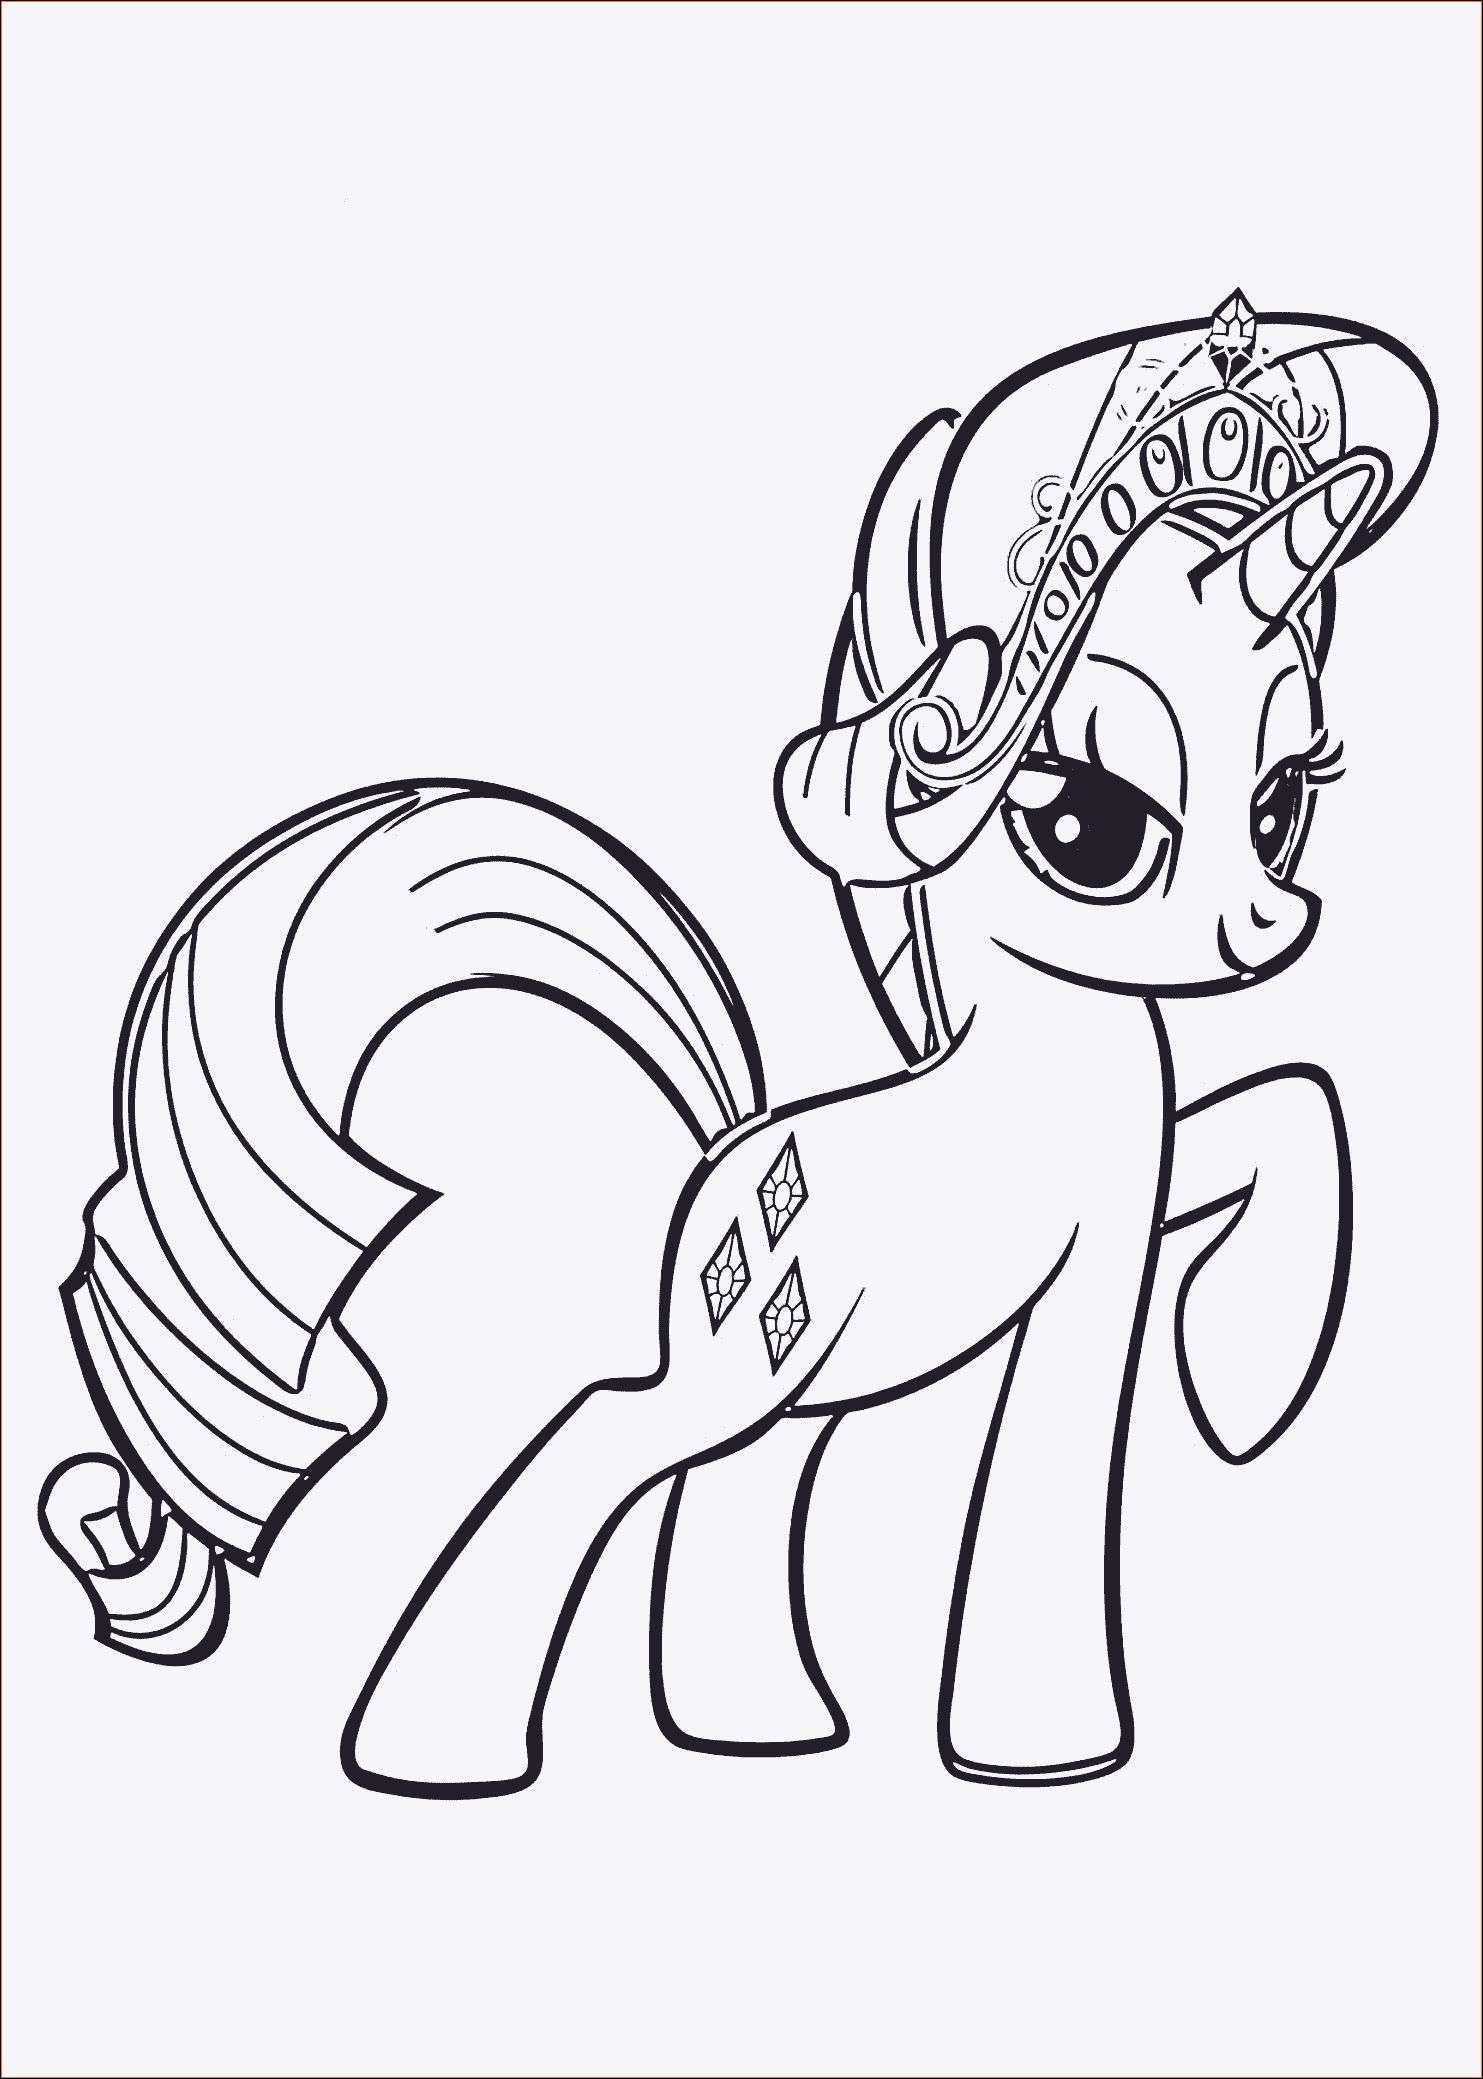 Ausmalbilder My Little Pony Equestria Girl Frisch Pin by Julia Colorings Pinterest Luxus Ausmalbilder My Little Sammlung